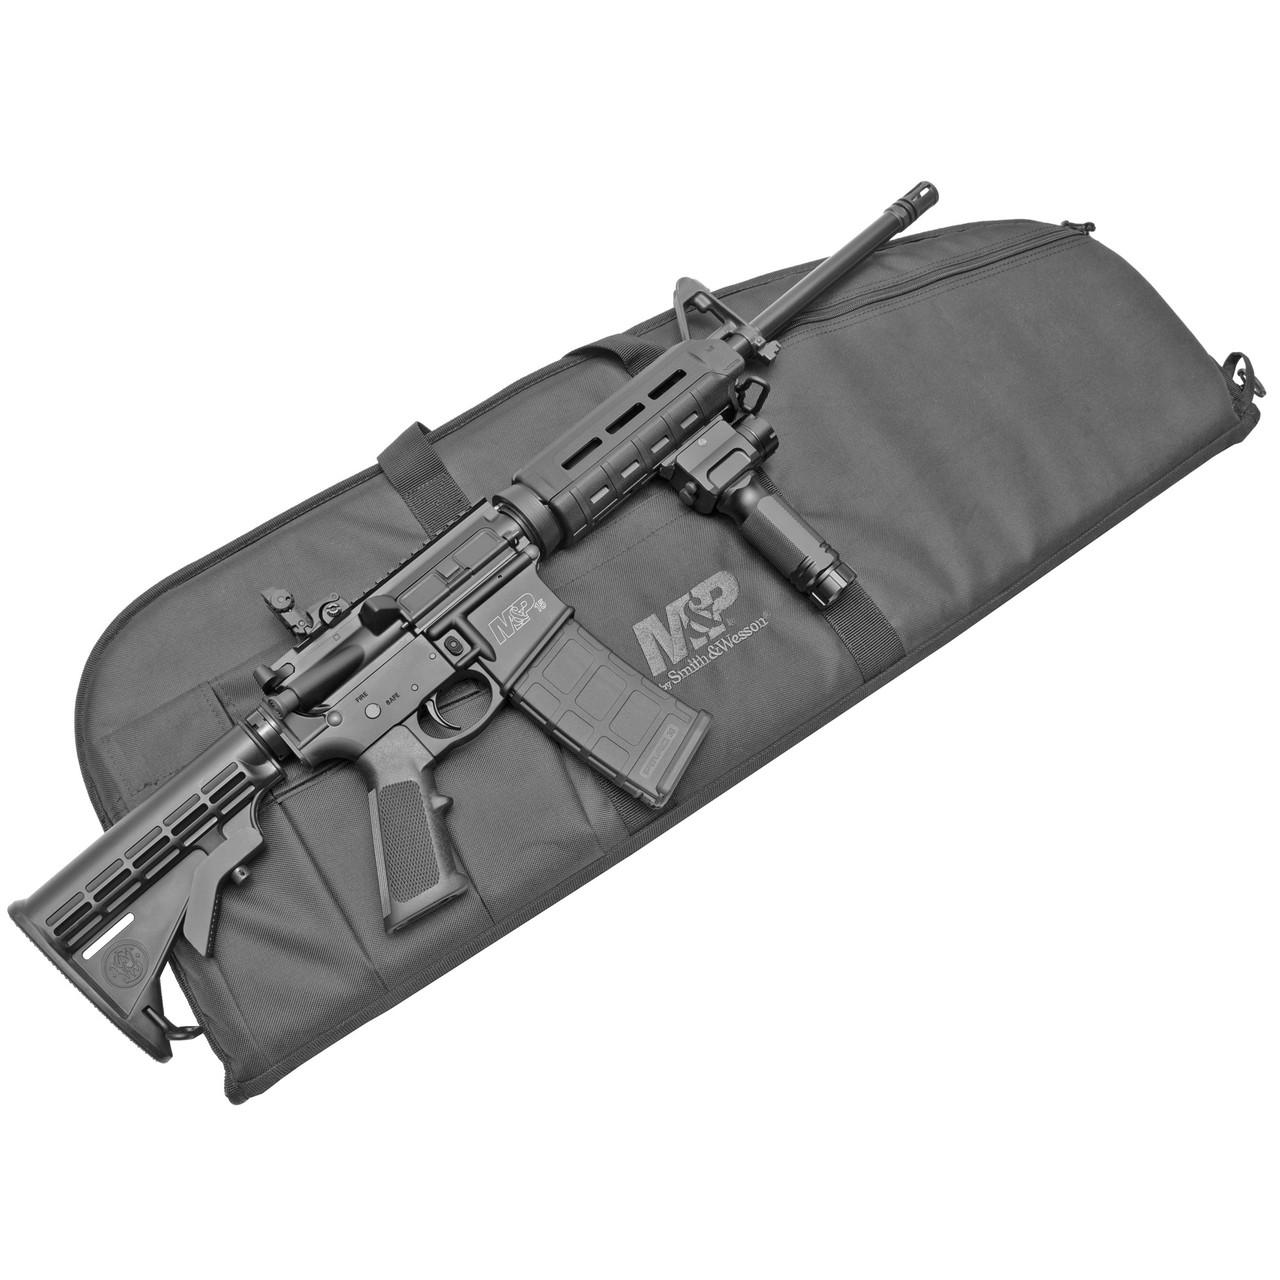 Smith & Wesson M&P 15 Sport II Crimson Foregrip CALIFORNIA LEGAL - .223/5.56